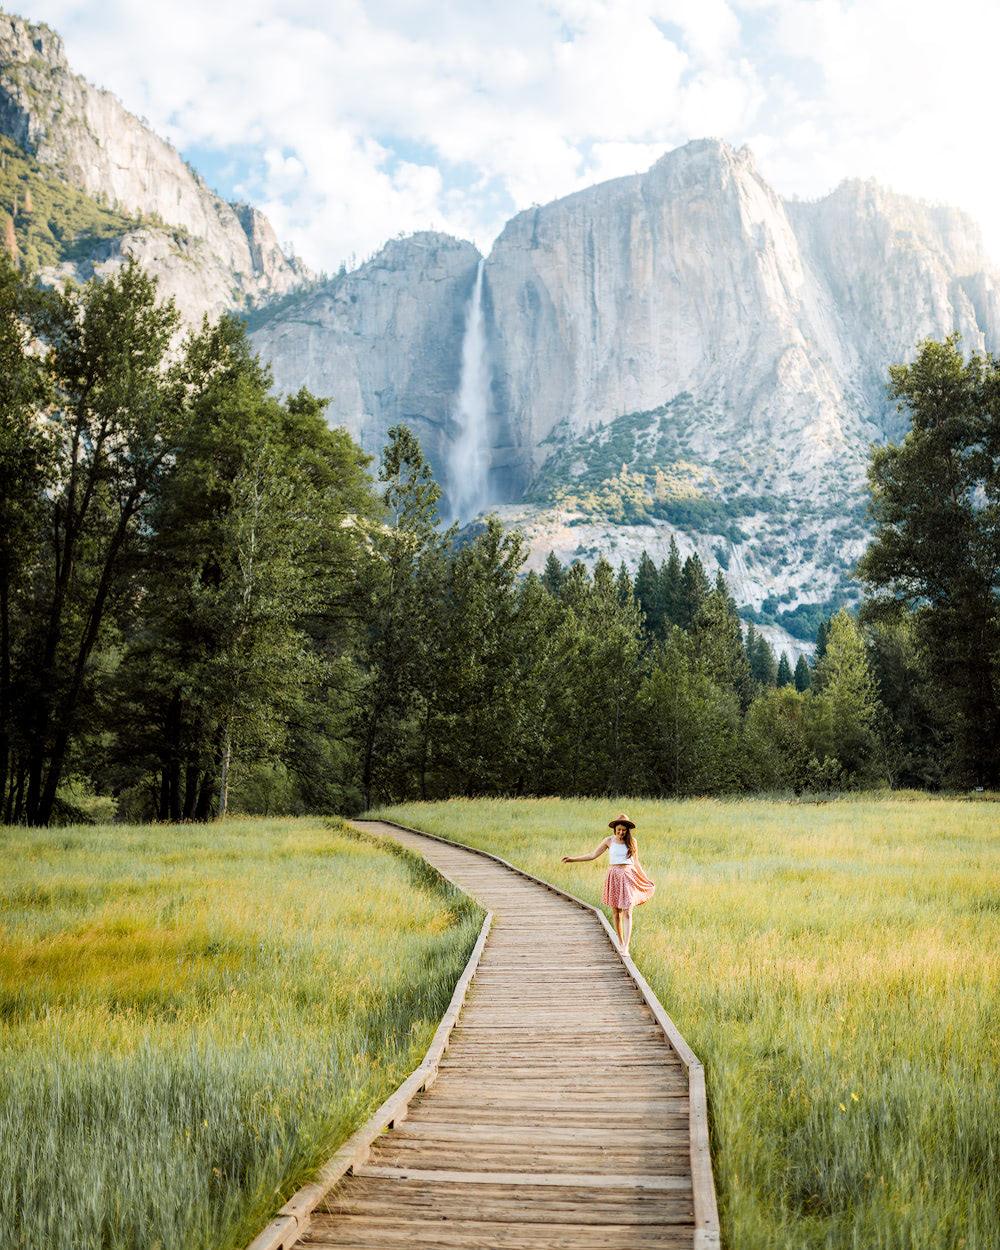 The Ultimate Guide to Exploring Yosemite National Park - Yosemite Valley Boardwalk